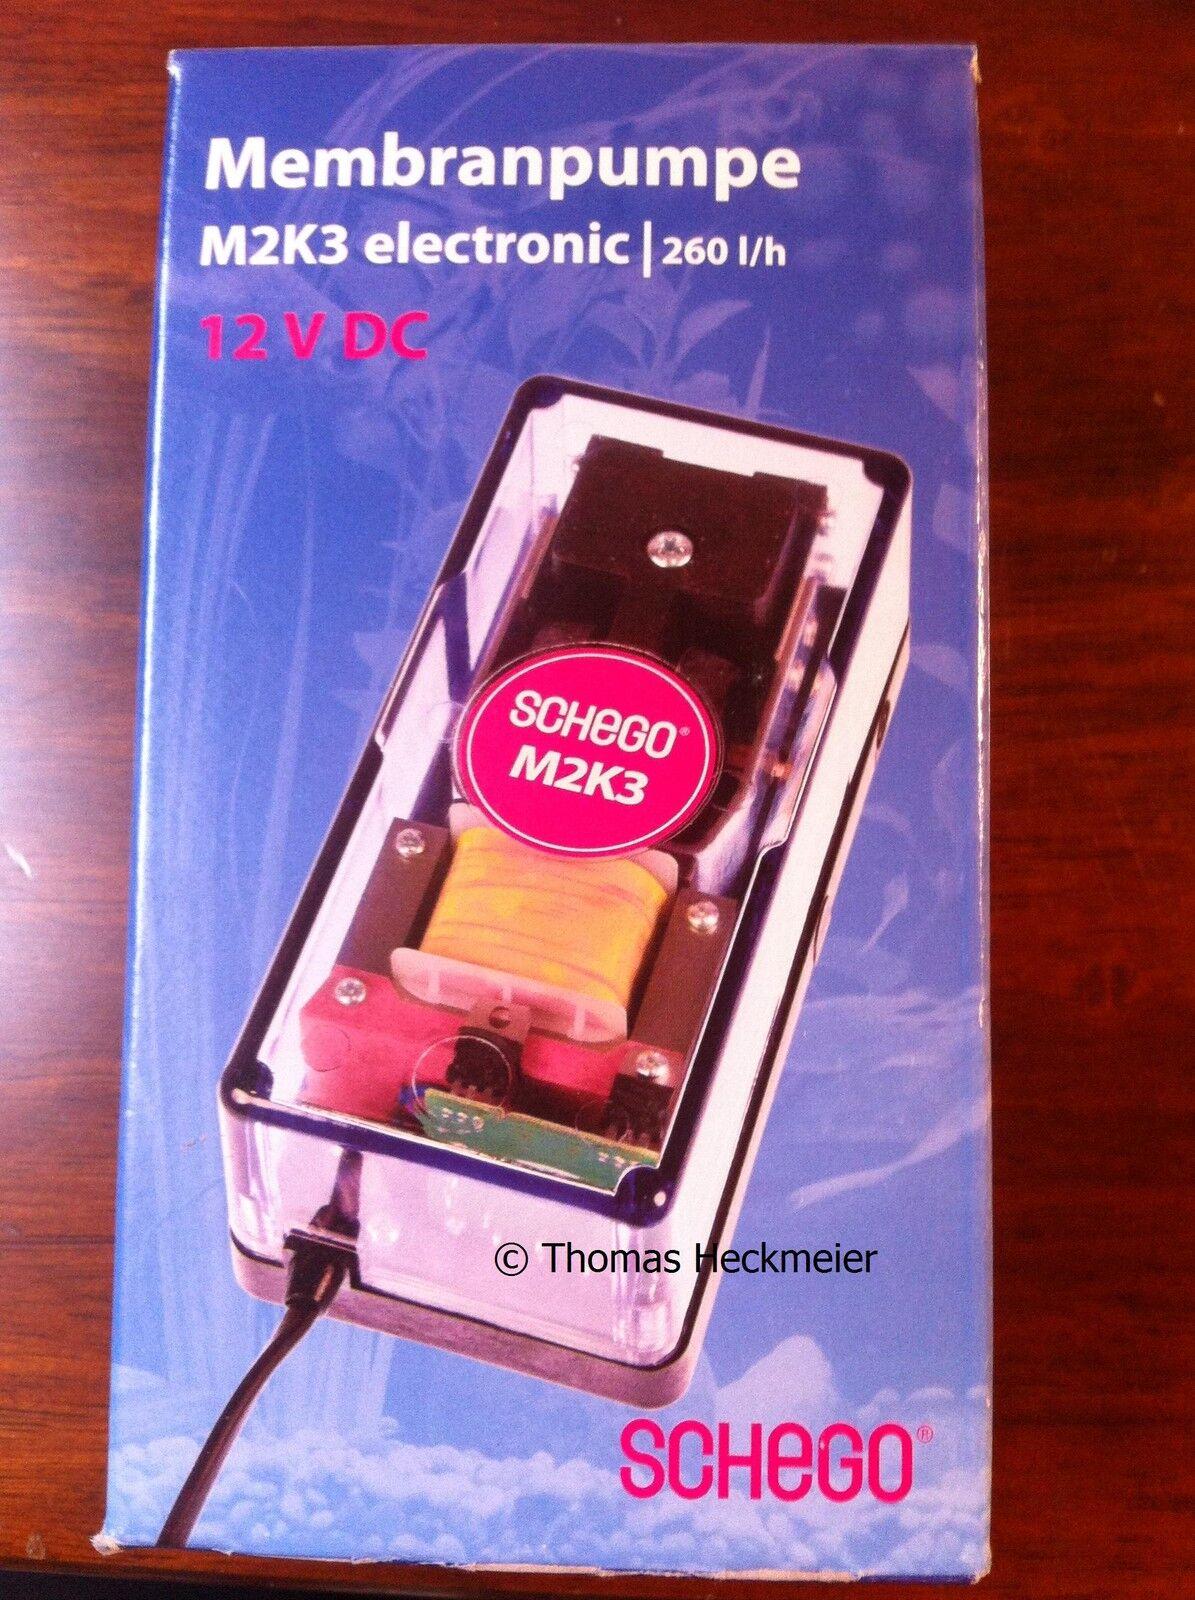 Schego M2K3 electronic 12 V Membranpumpe   Durchlüfter   Luftpumpe Aquarium